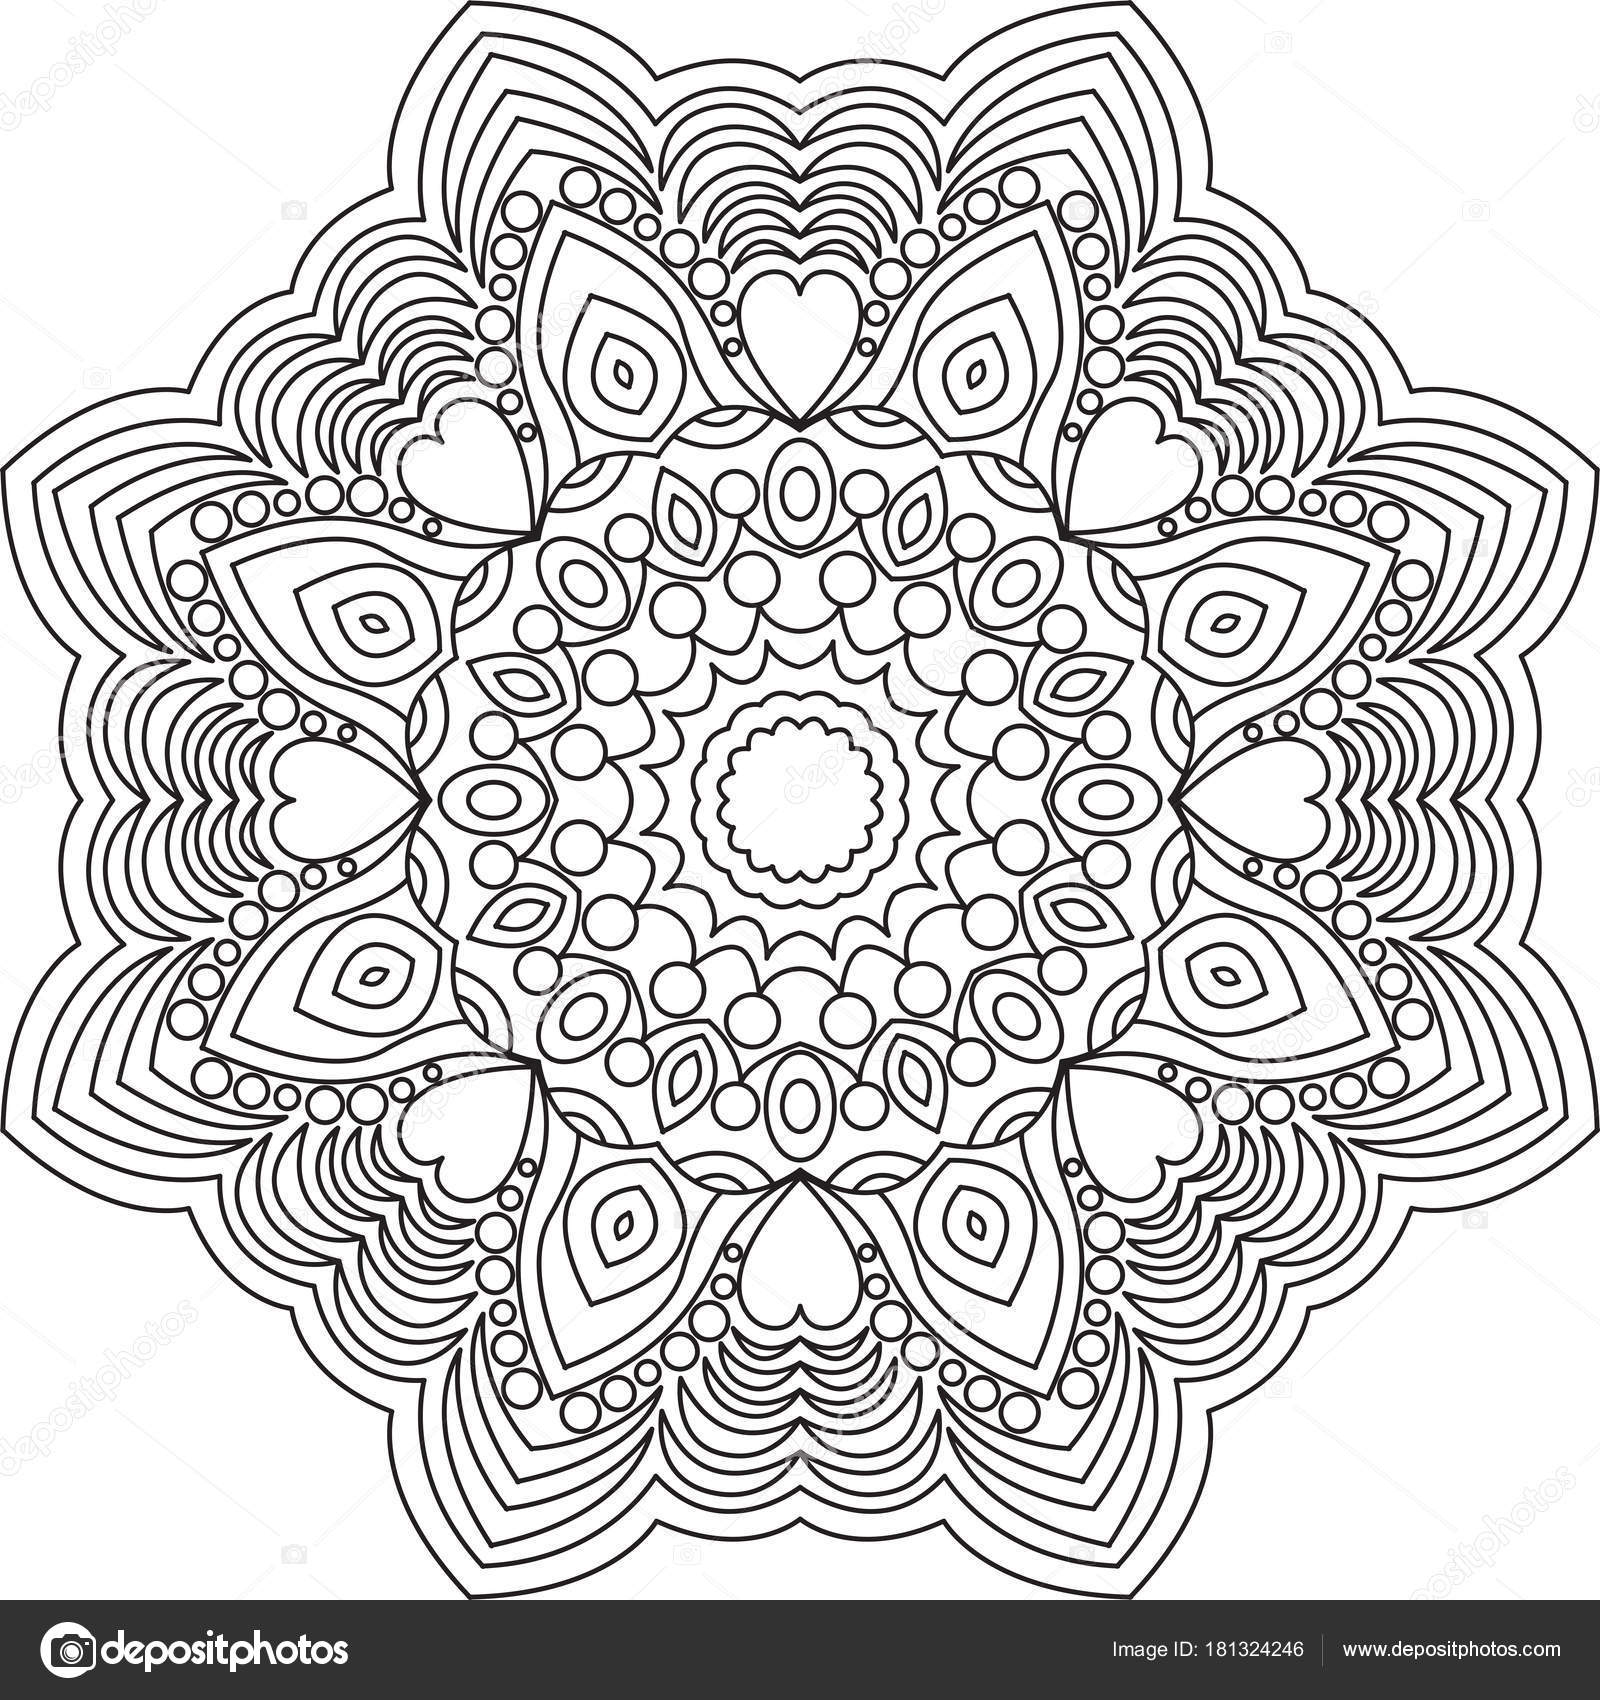 Coloriage Mandala Rond.Mandala Pour Adultes Coloriage Livre Apercu Coloriage Mandala